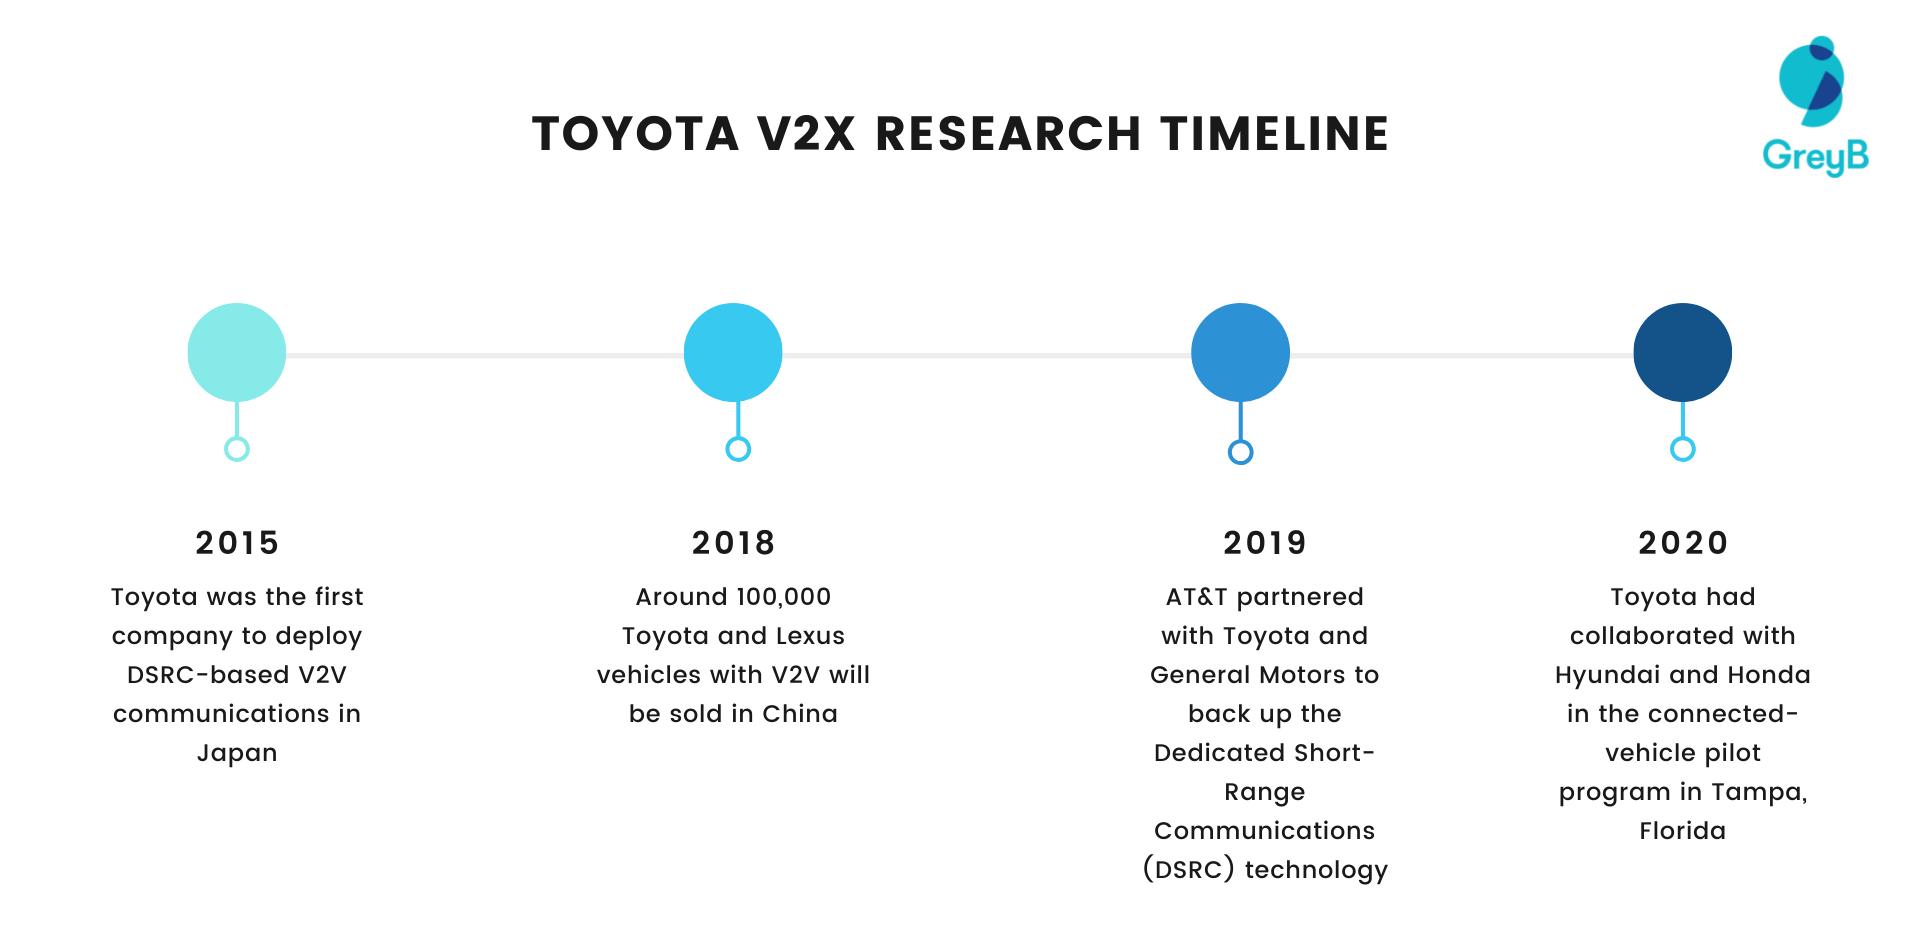 Toyota V2X Research Timeline